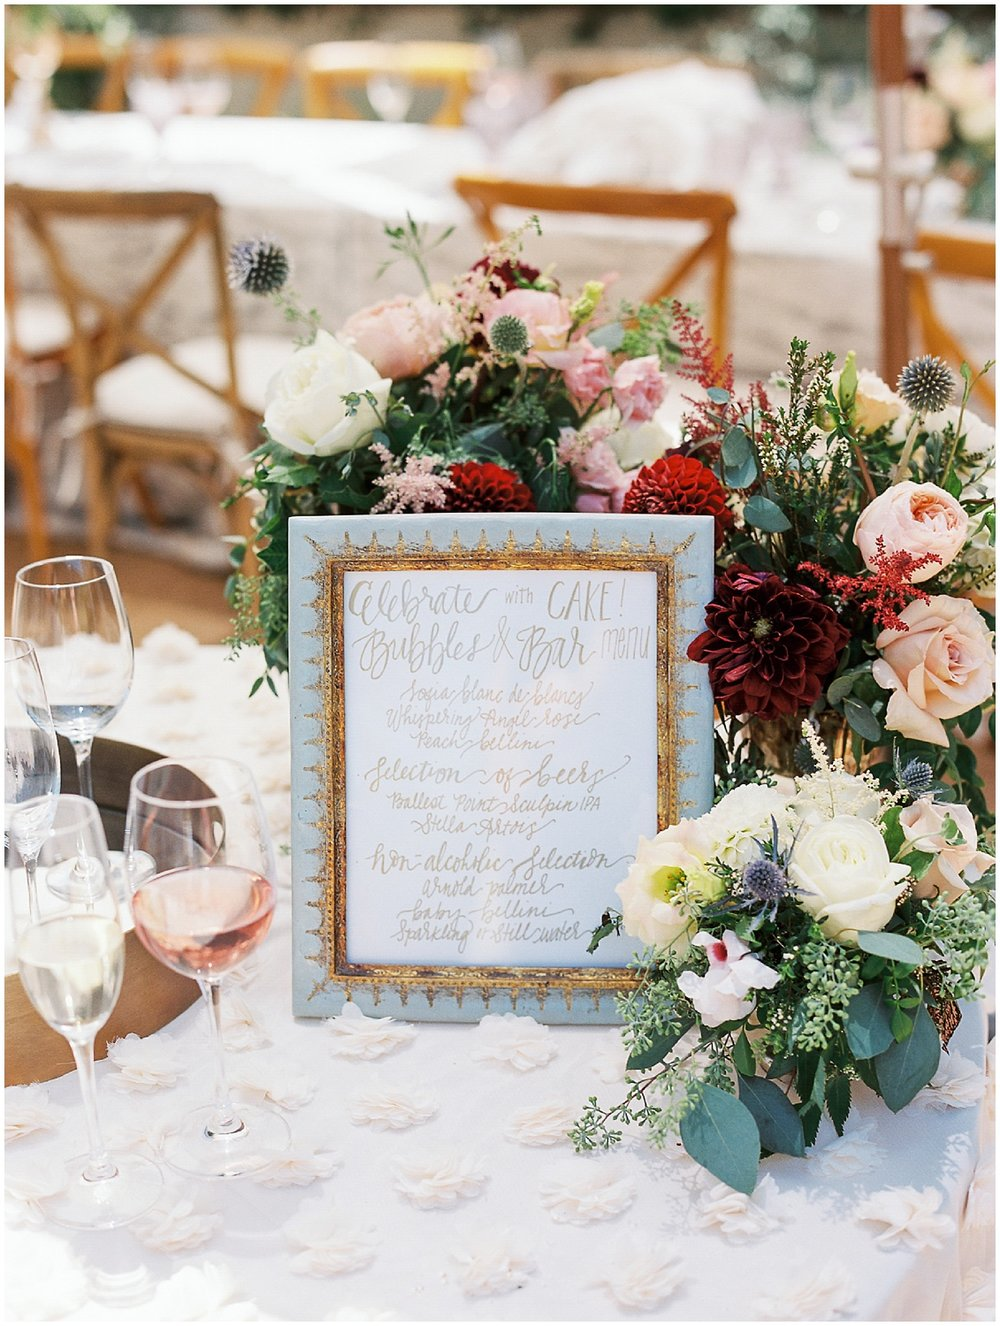 Yorba Linda wedding and social event planning brunch